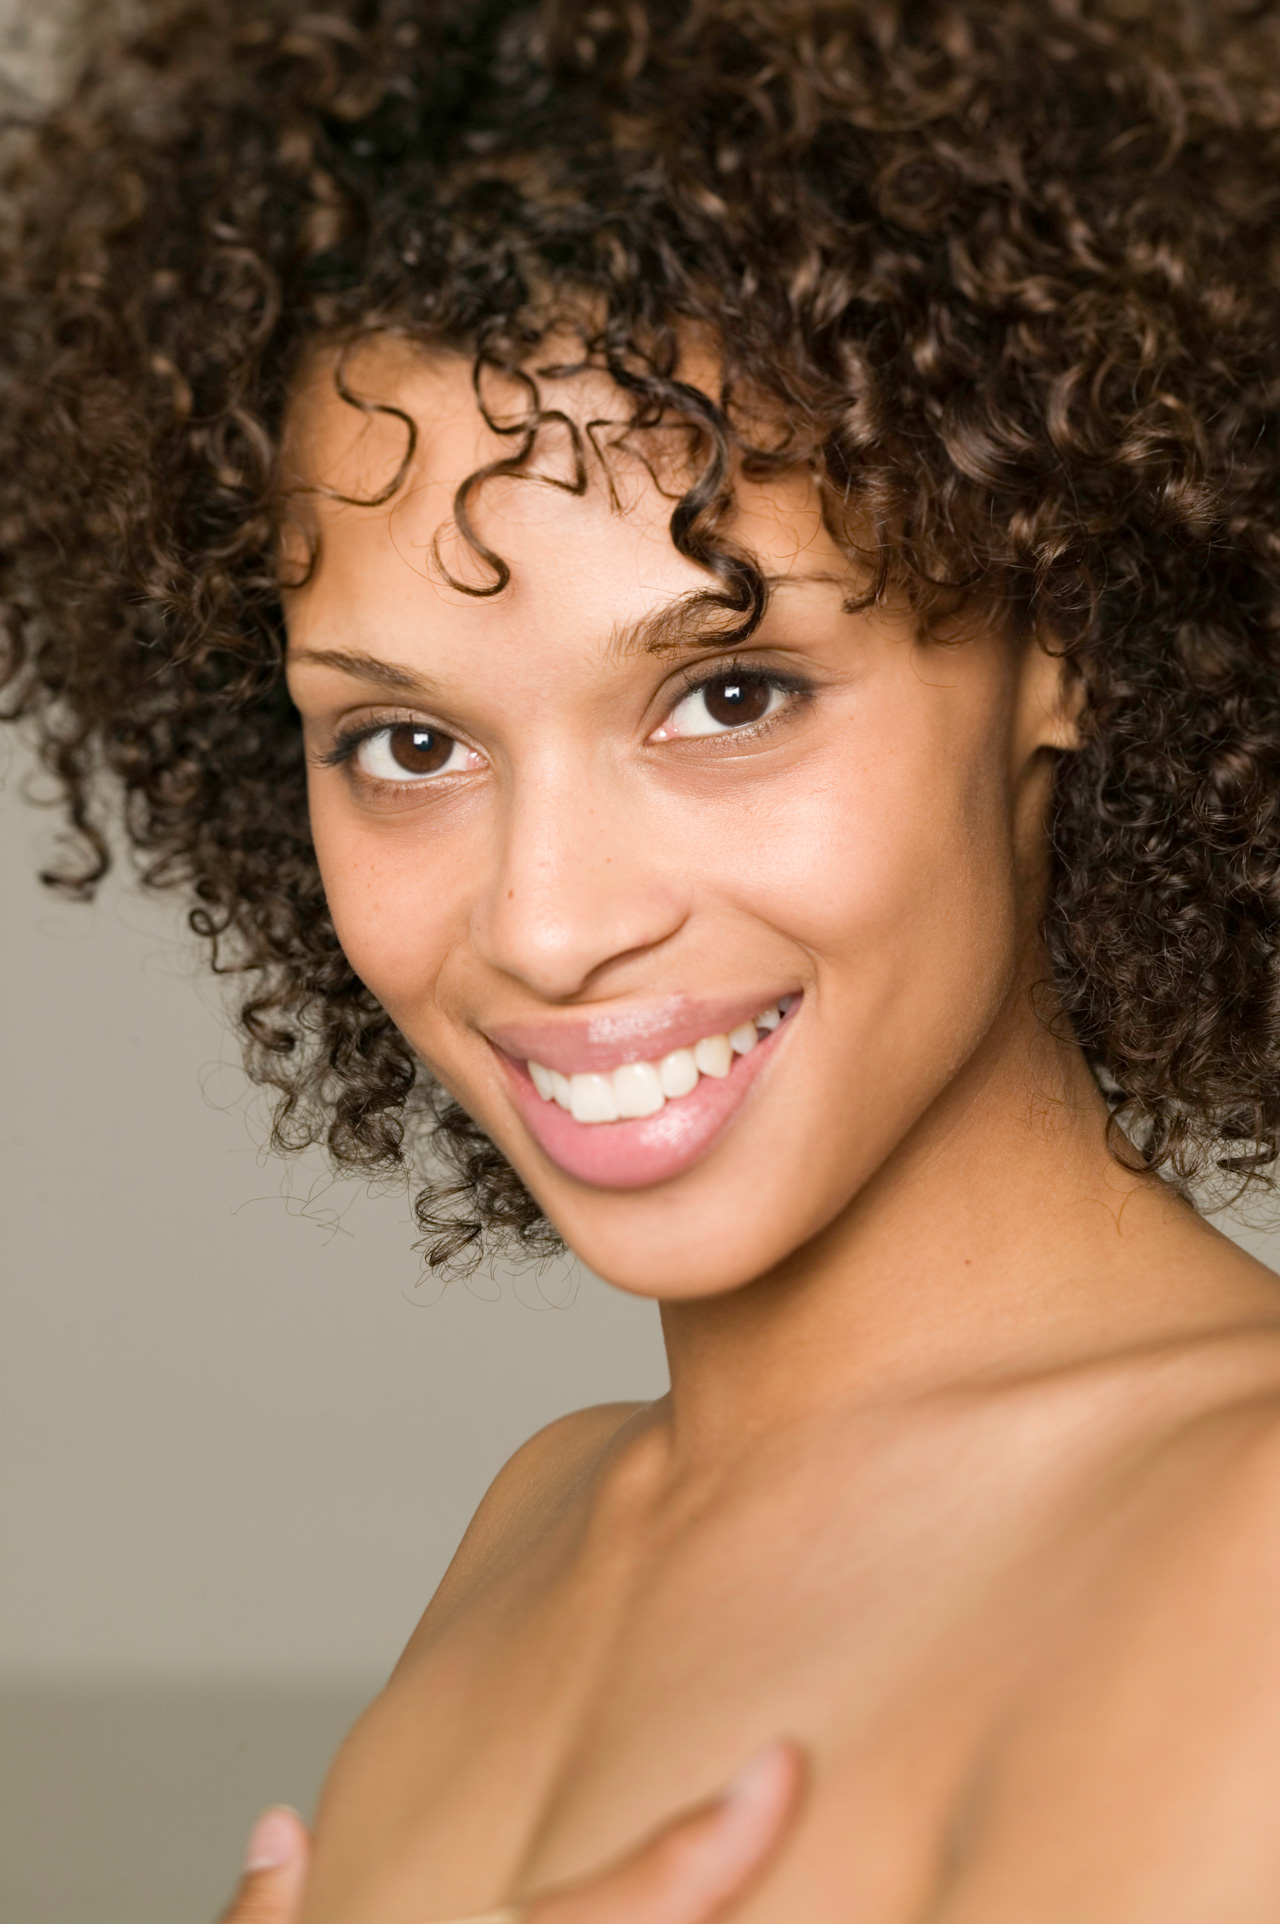 Crochet Hair Nairobi : Human Hair Crochet Braids? Crochet Braids By Twana